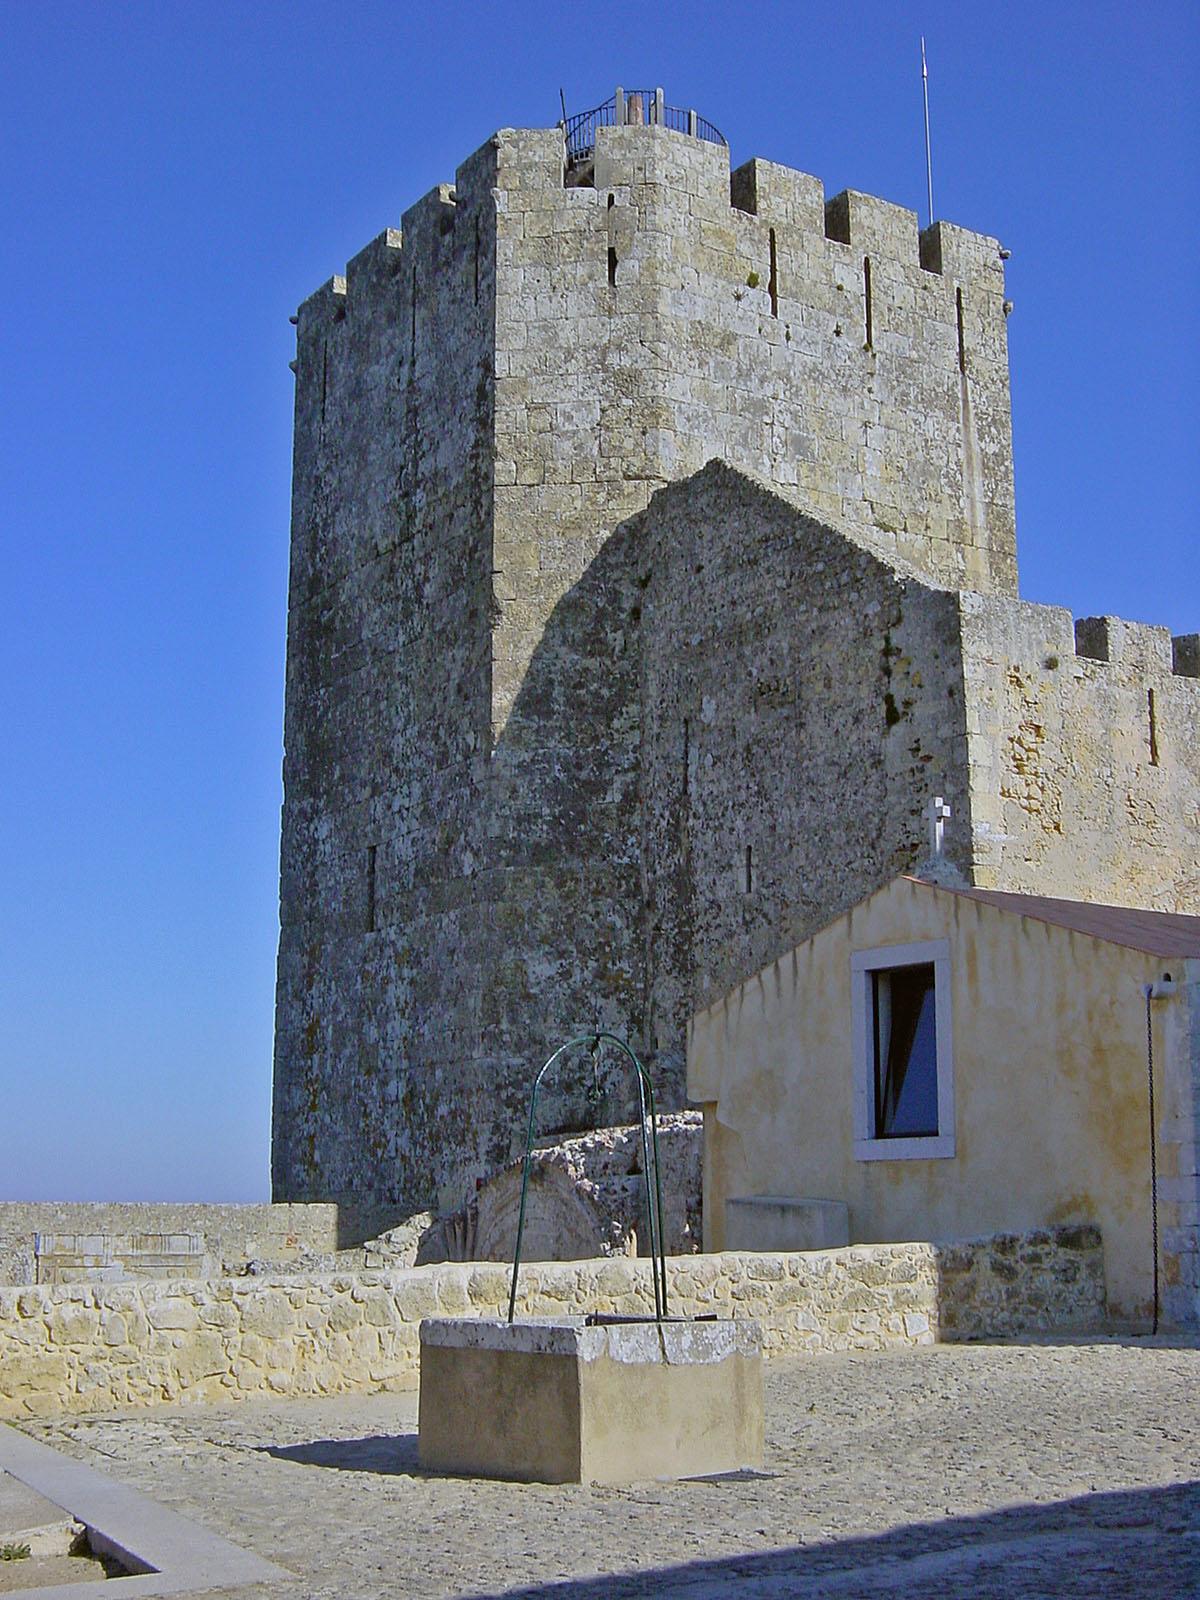 https://i0.wp.com/upload.wikimedia.org/wikipedia/commons/a/ae/Castelo_de_Palmela.JPG